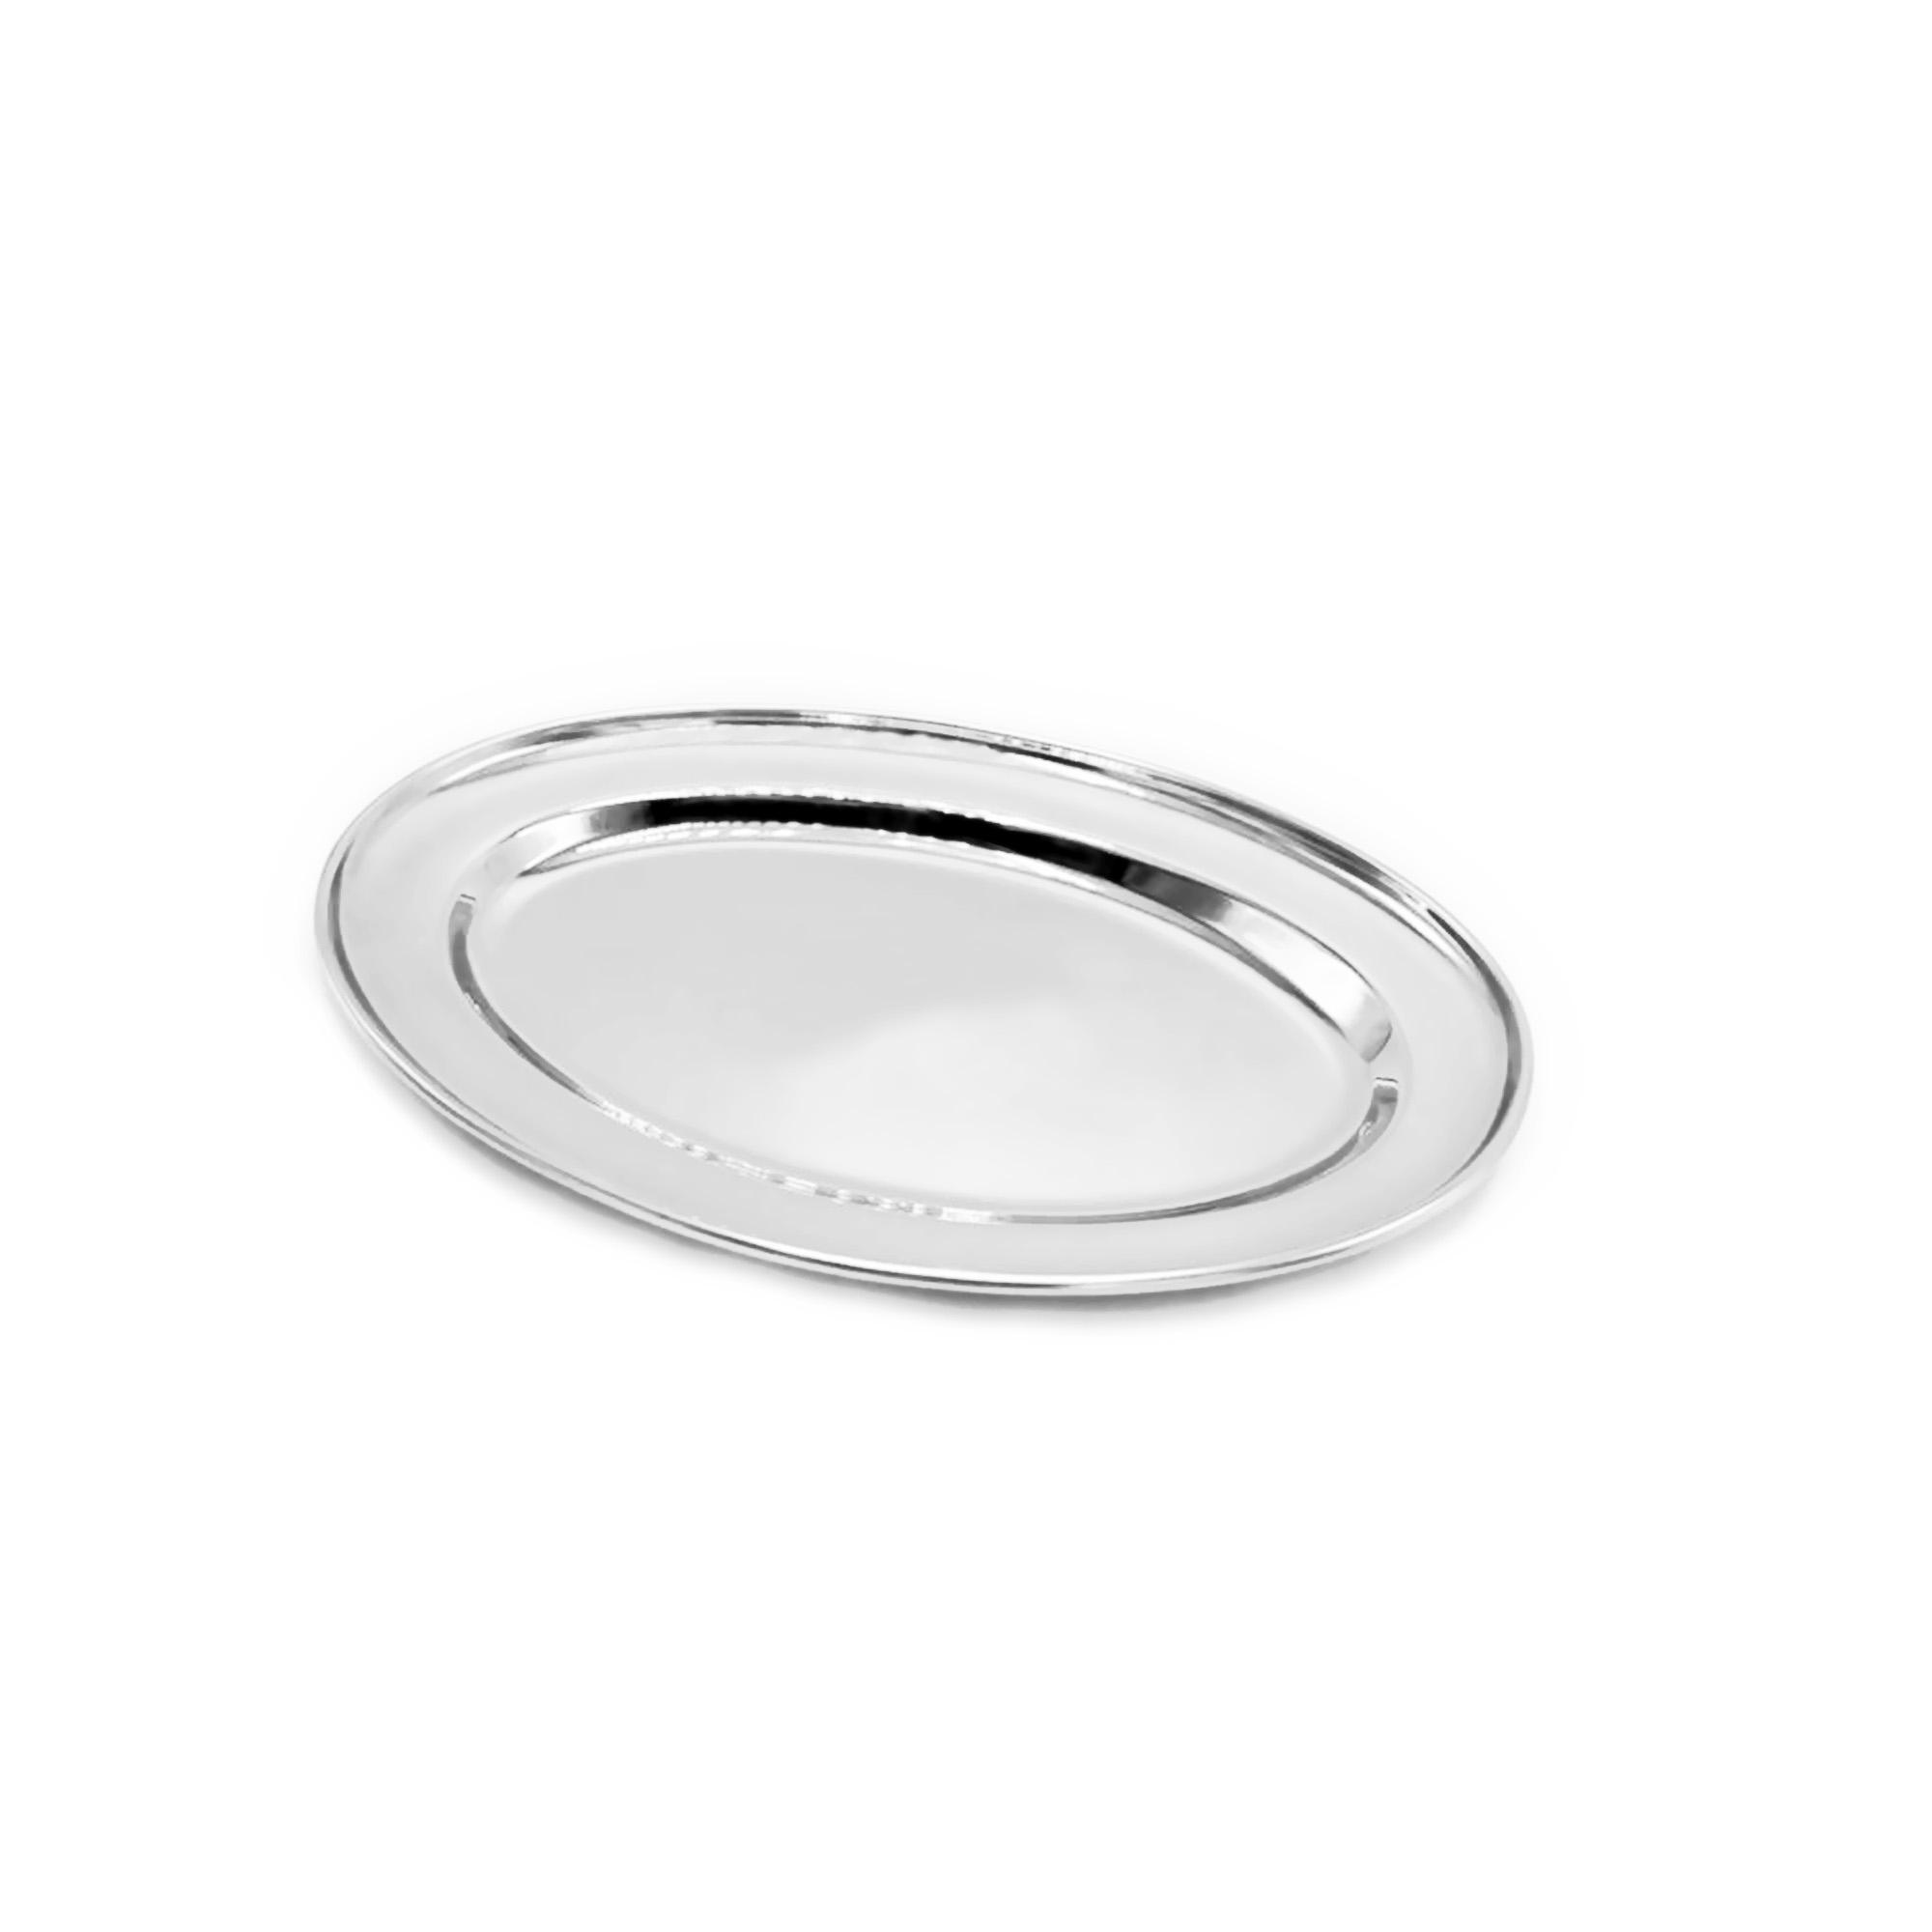 Travessa Oval Plana 25cm Inox Attuale